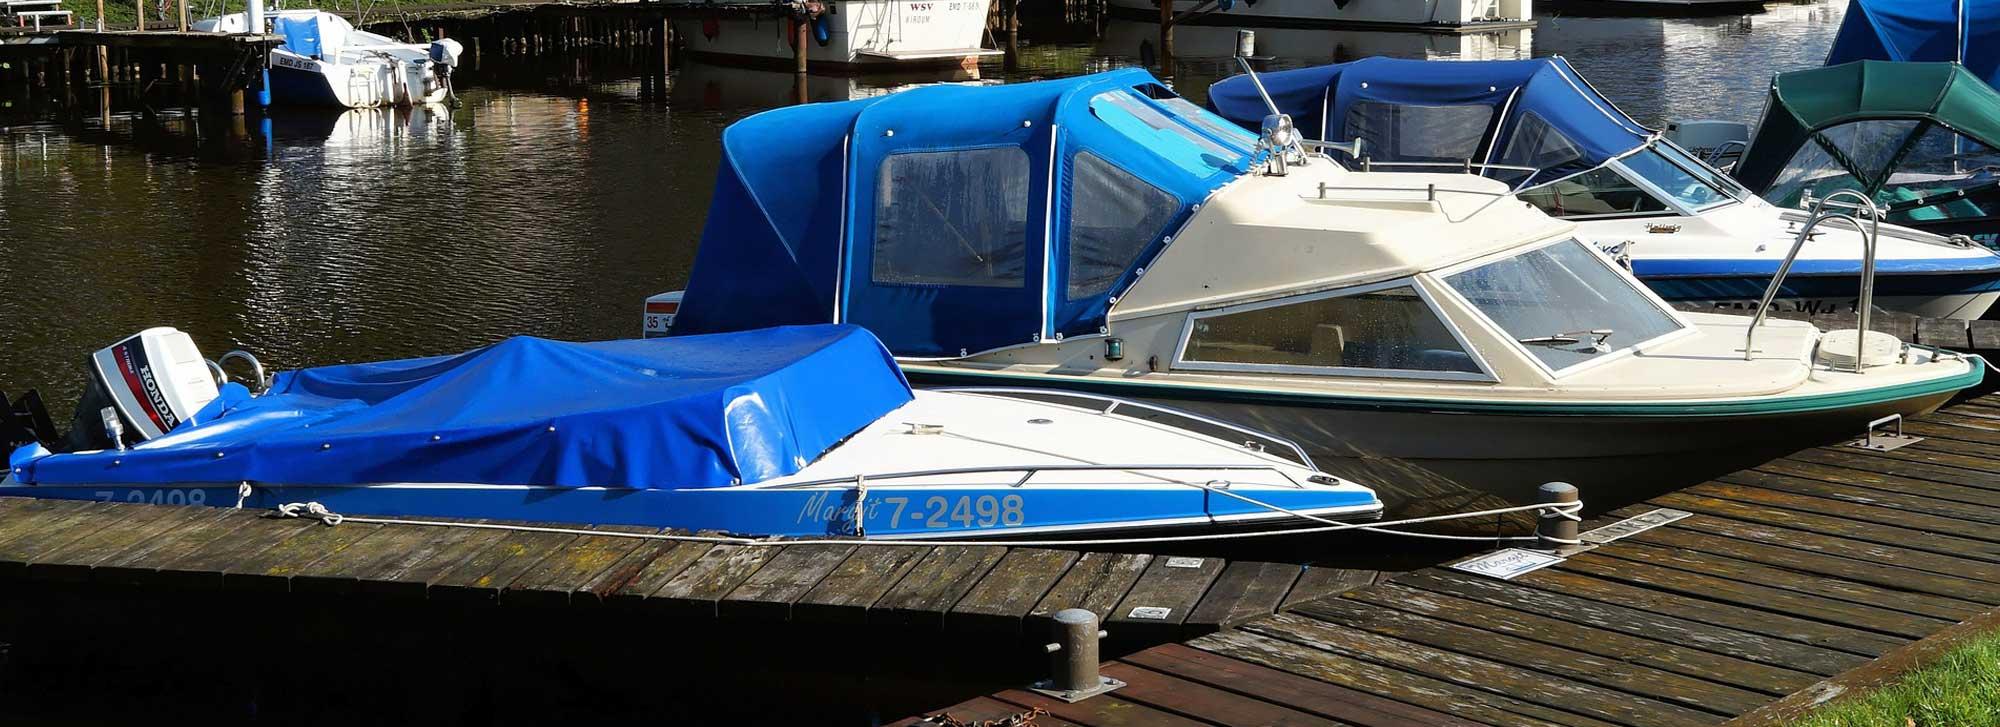 Motor & Boat Canopies